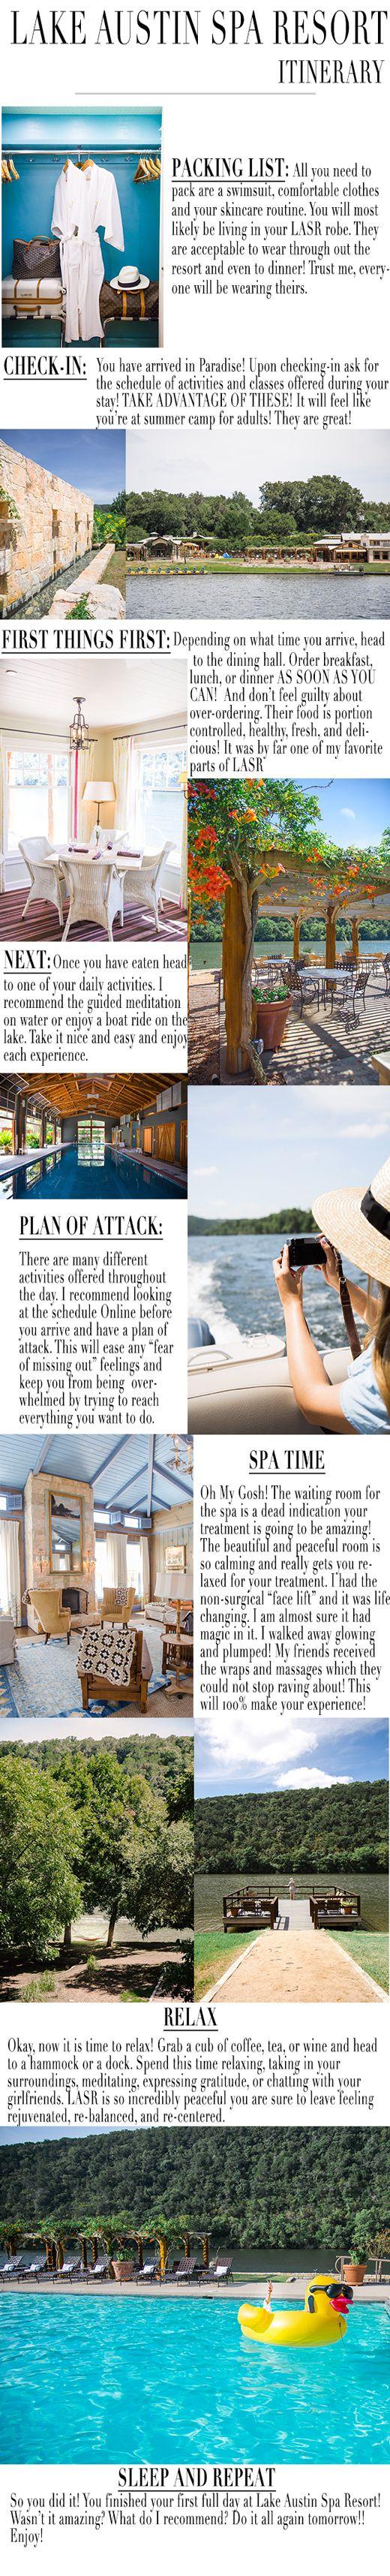 Lake Austin Spa Resort Itenerary | So Then They Say Blog